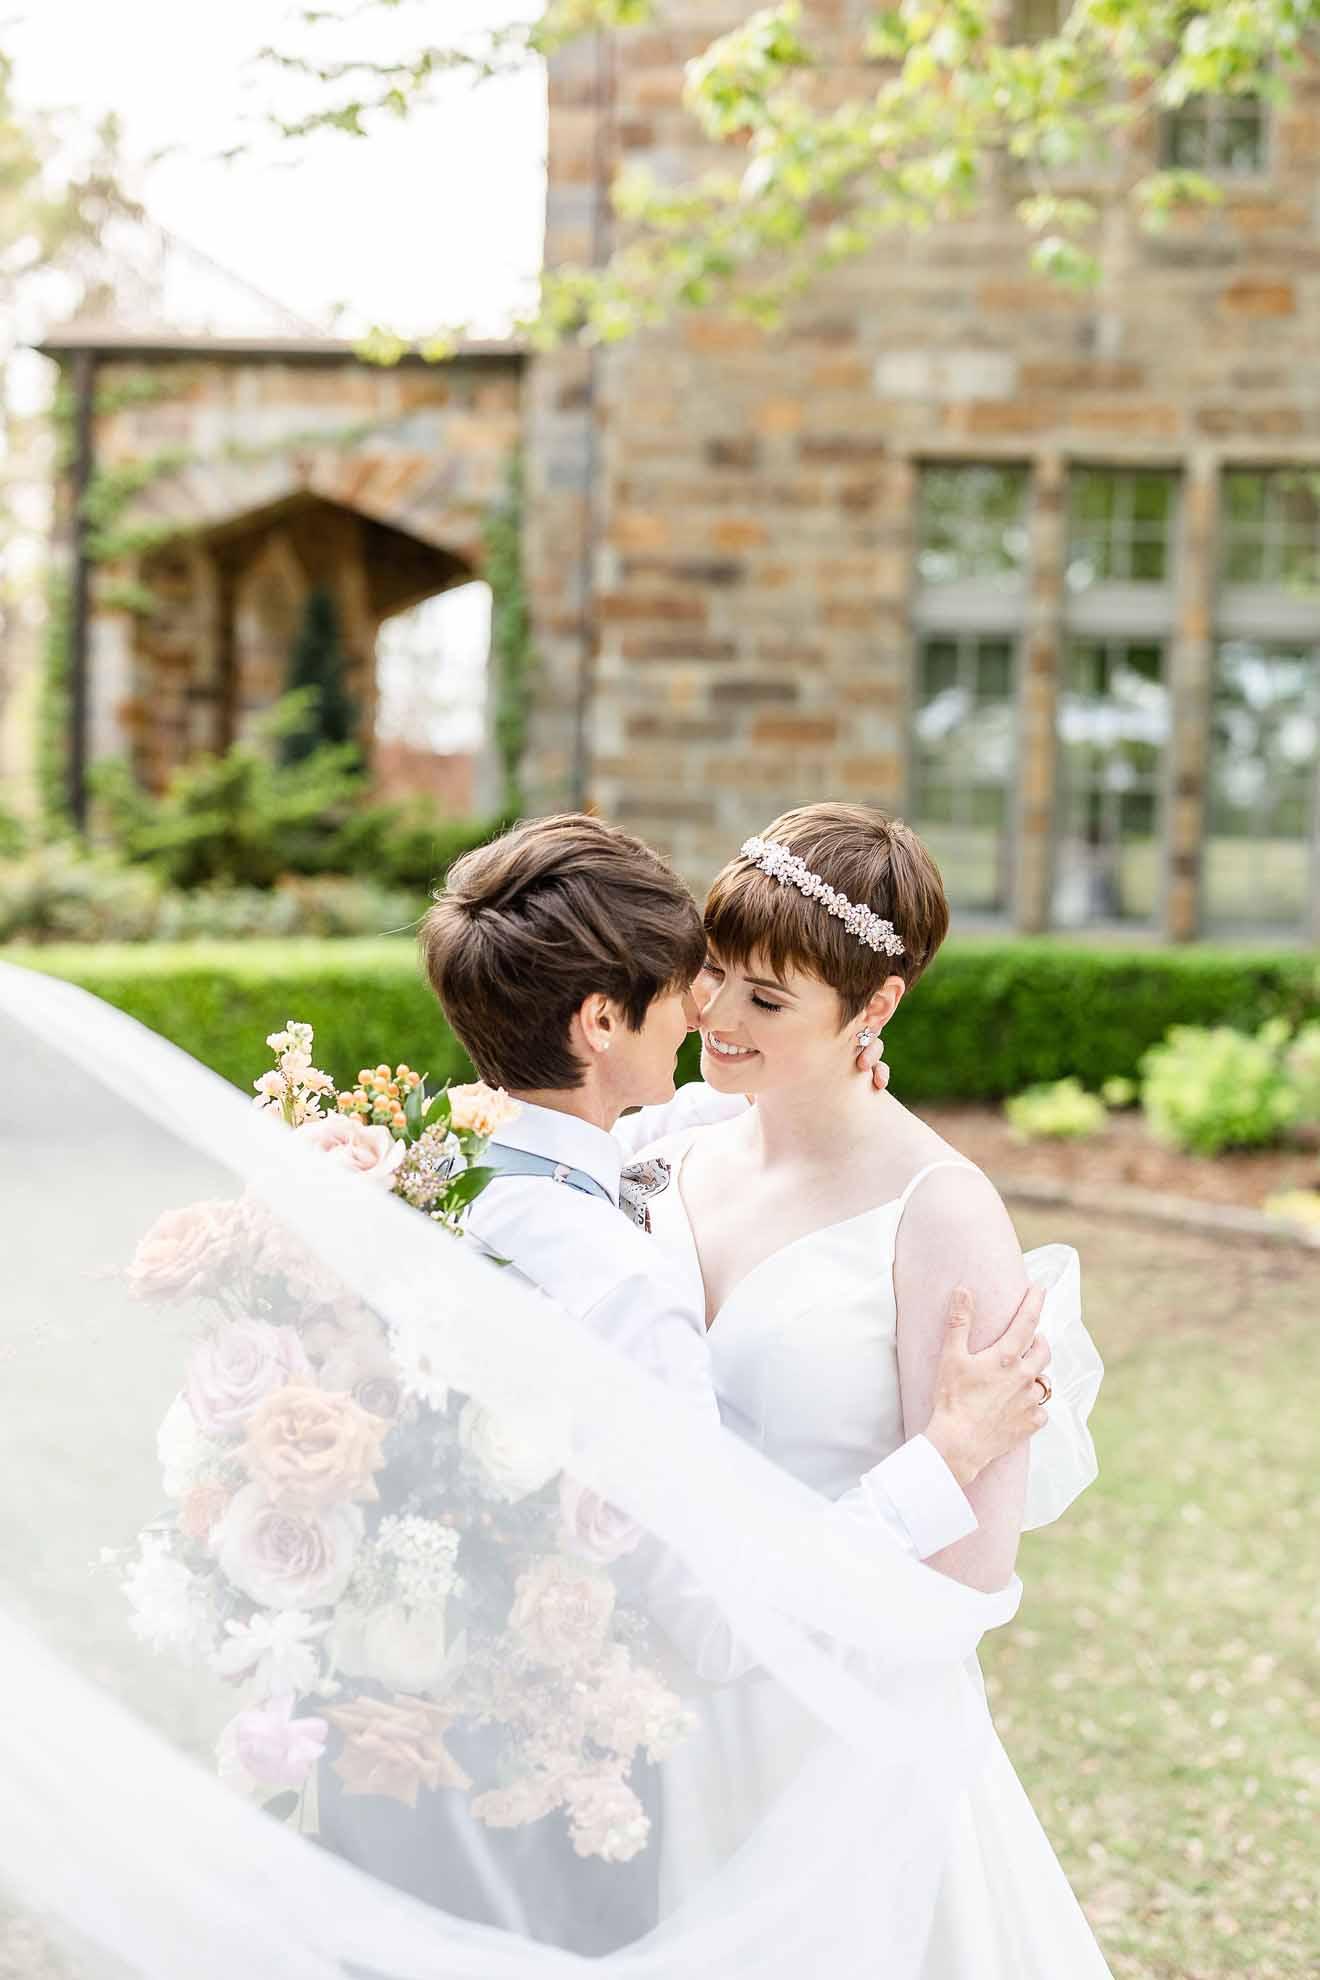 Morgan Lee Ansel photography lesbian same-sex LGBTQIA+ manor wedding Arkansas USA Dancing With Her (4)